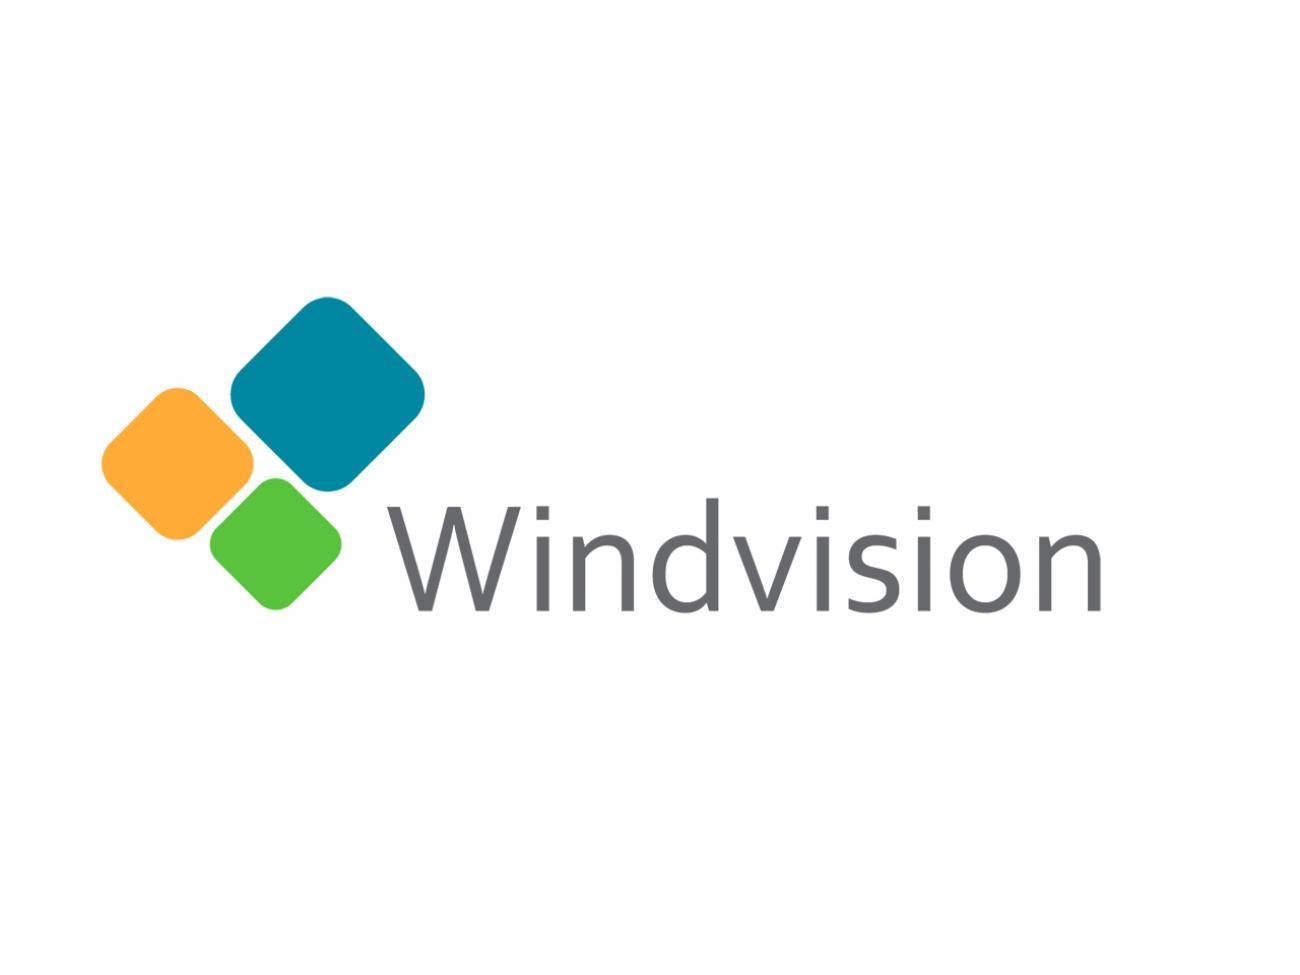 Windvision logo